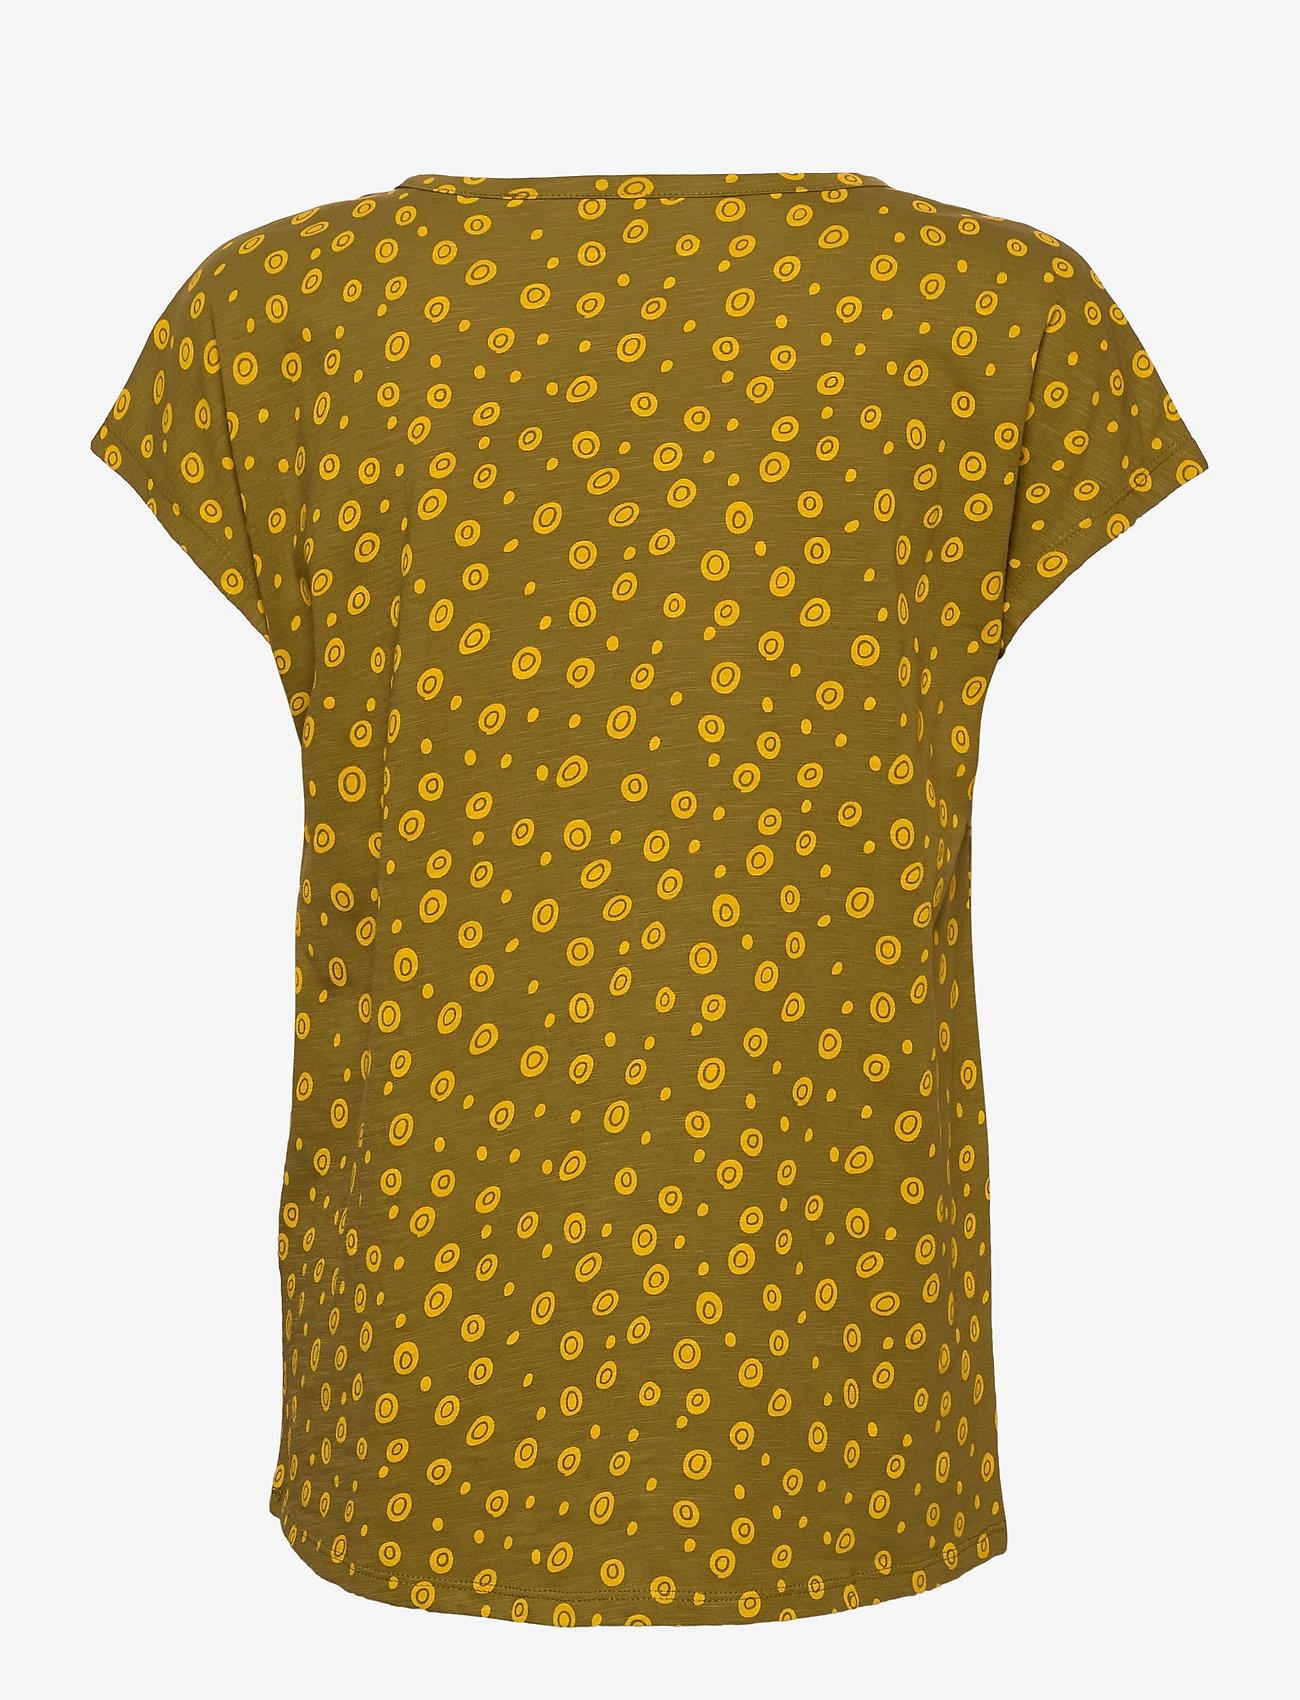 Esprit Casual - T-Shirts - t-shirts - olive - 1